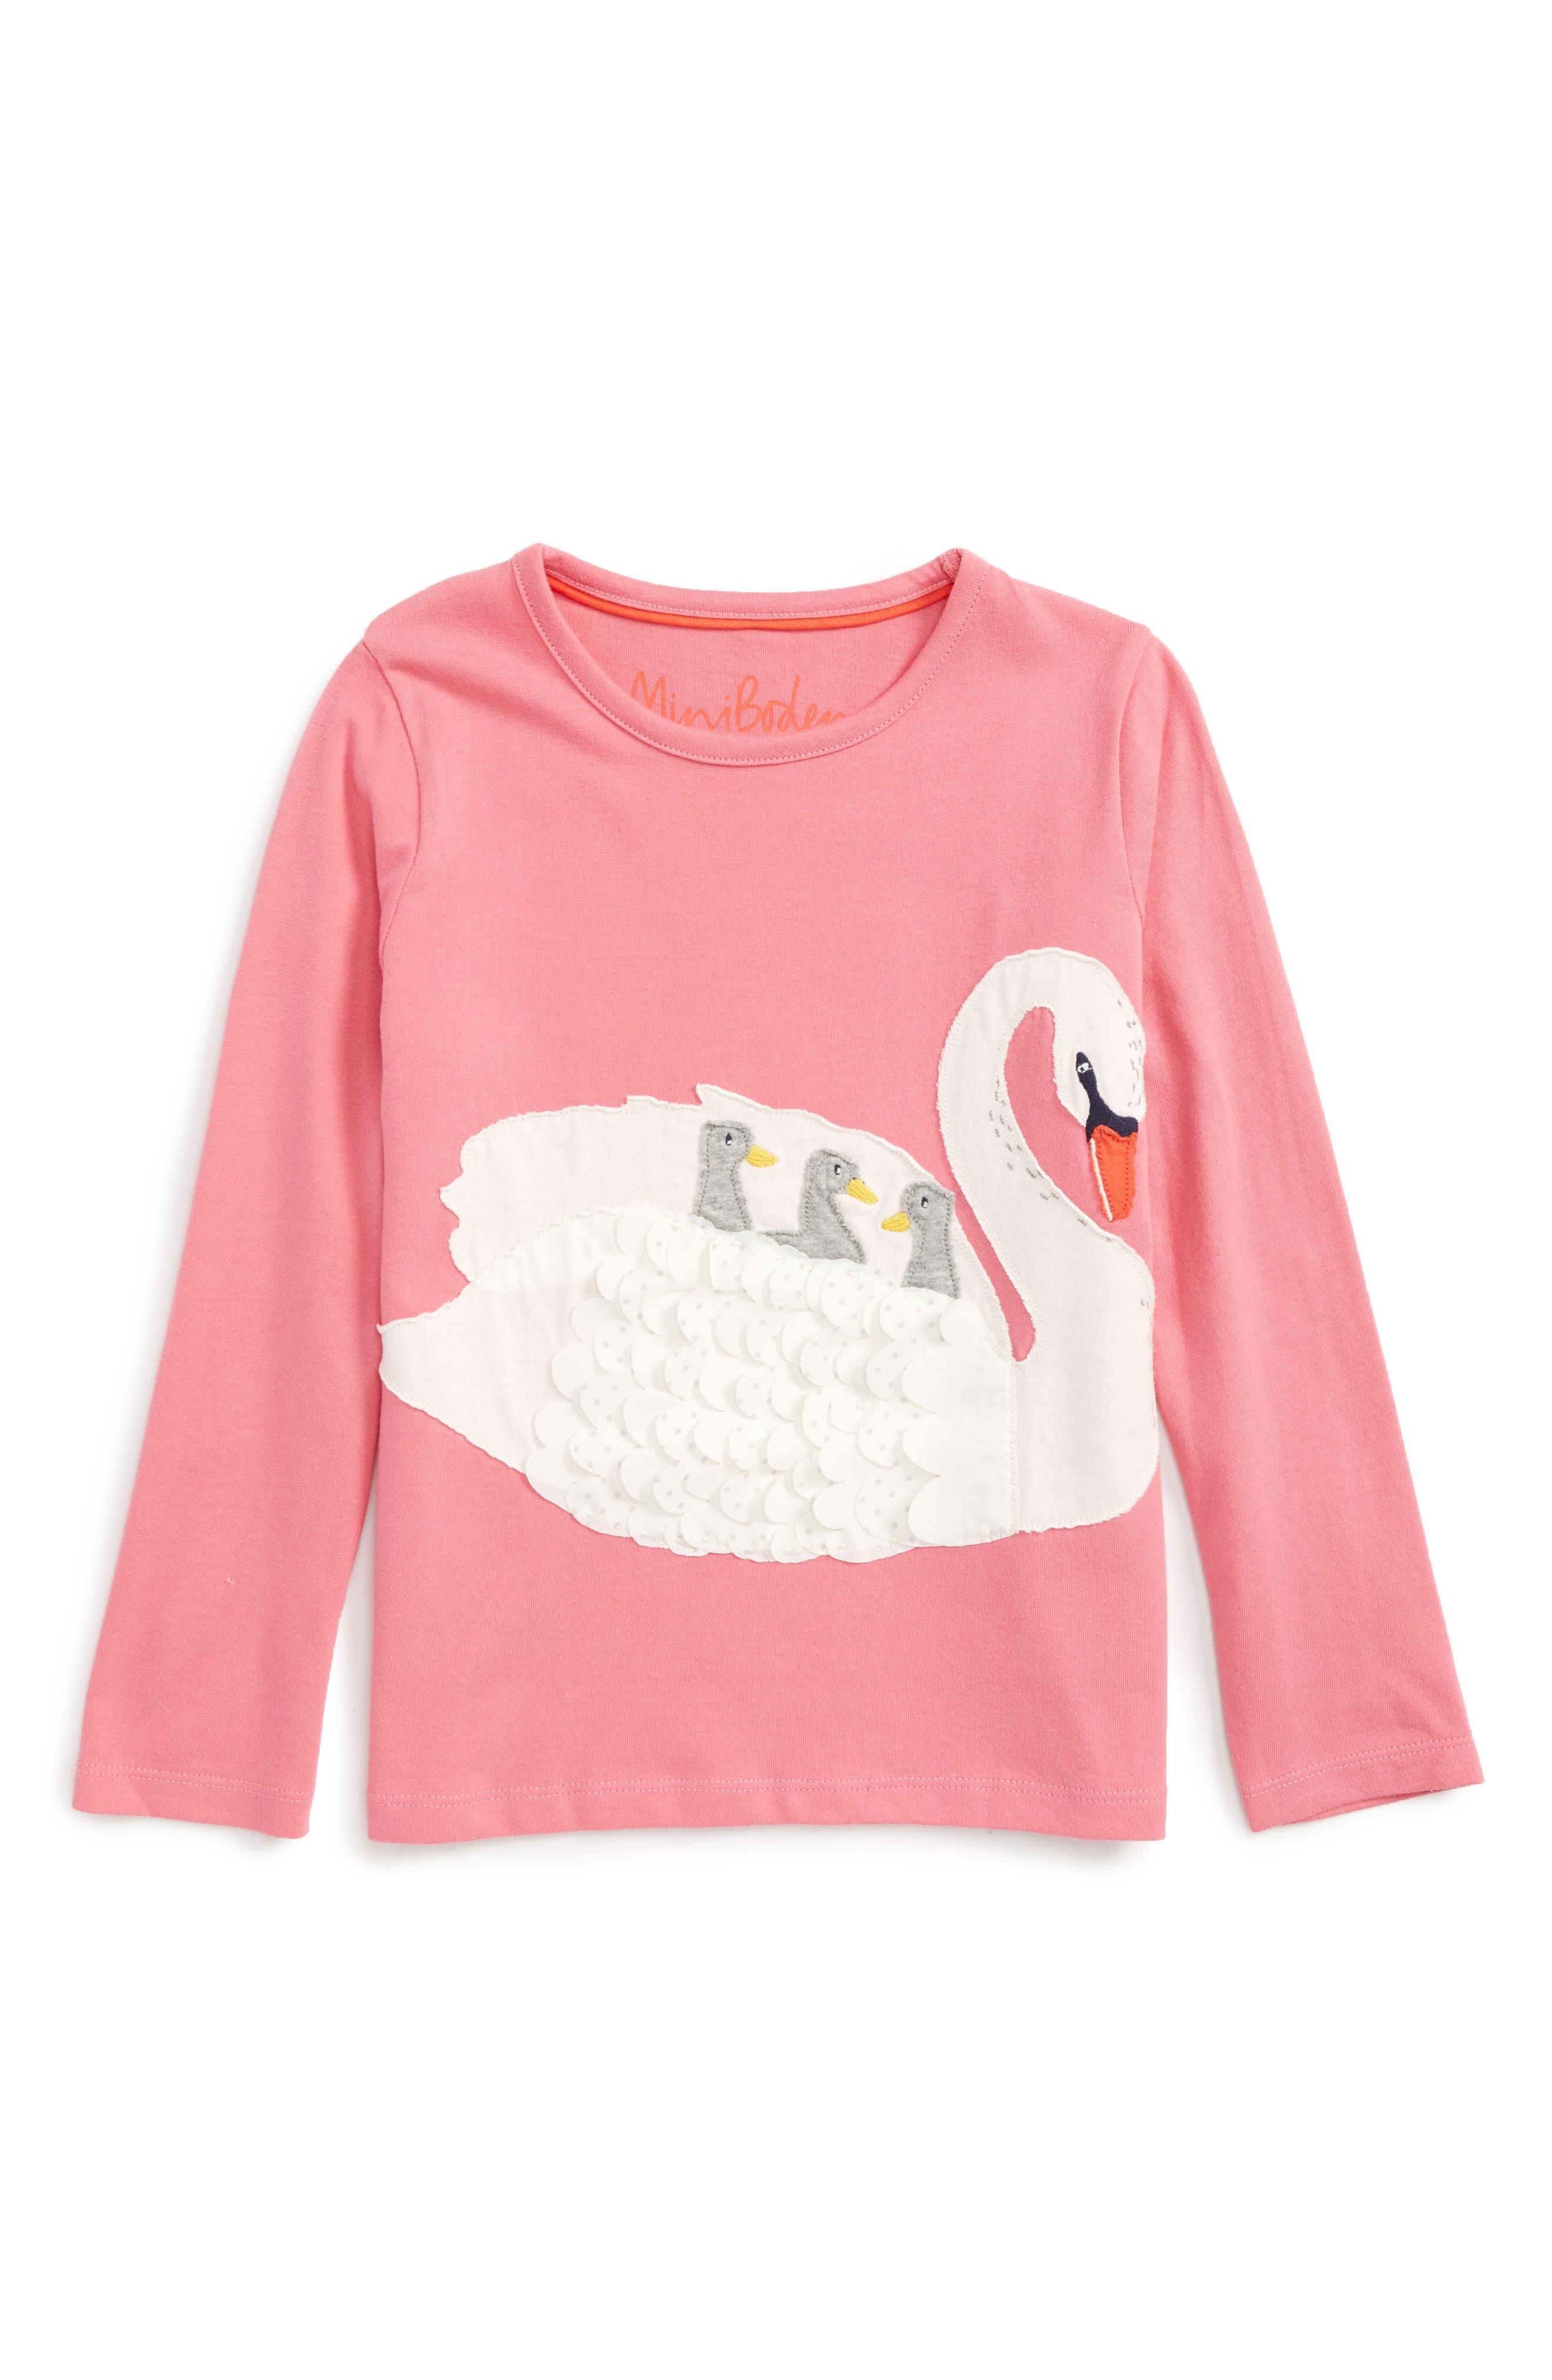 Boden Big Appliqué T-Shirt,                         Main,                         color, Soft Plum Blossom